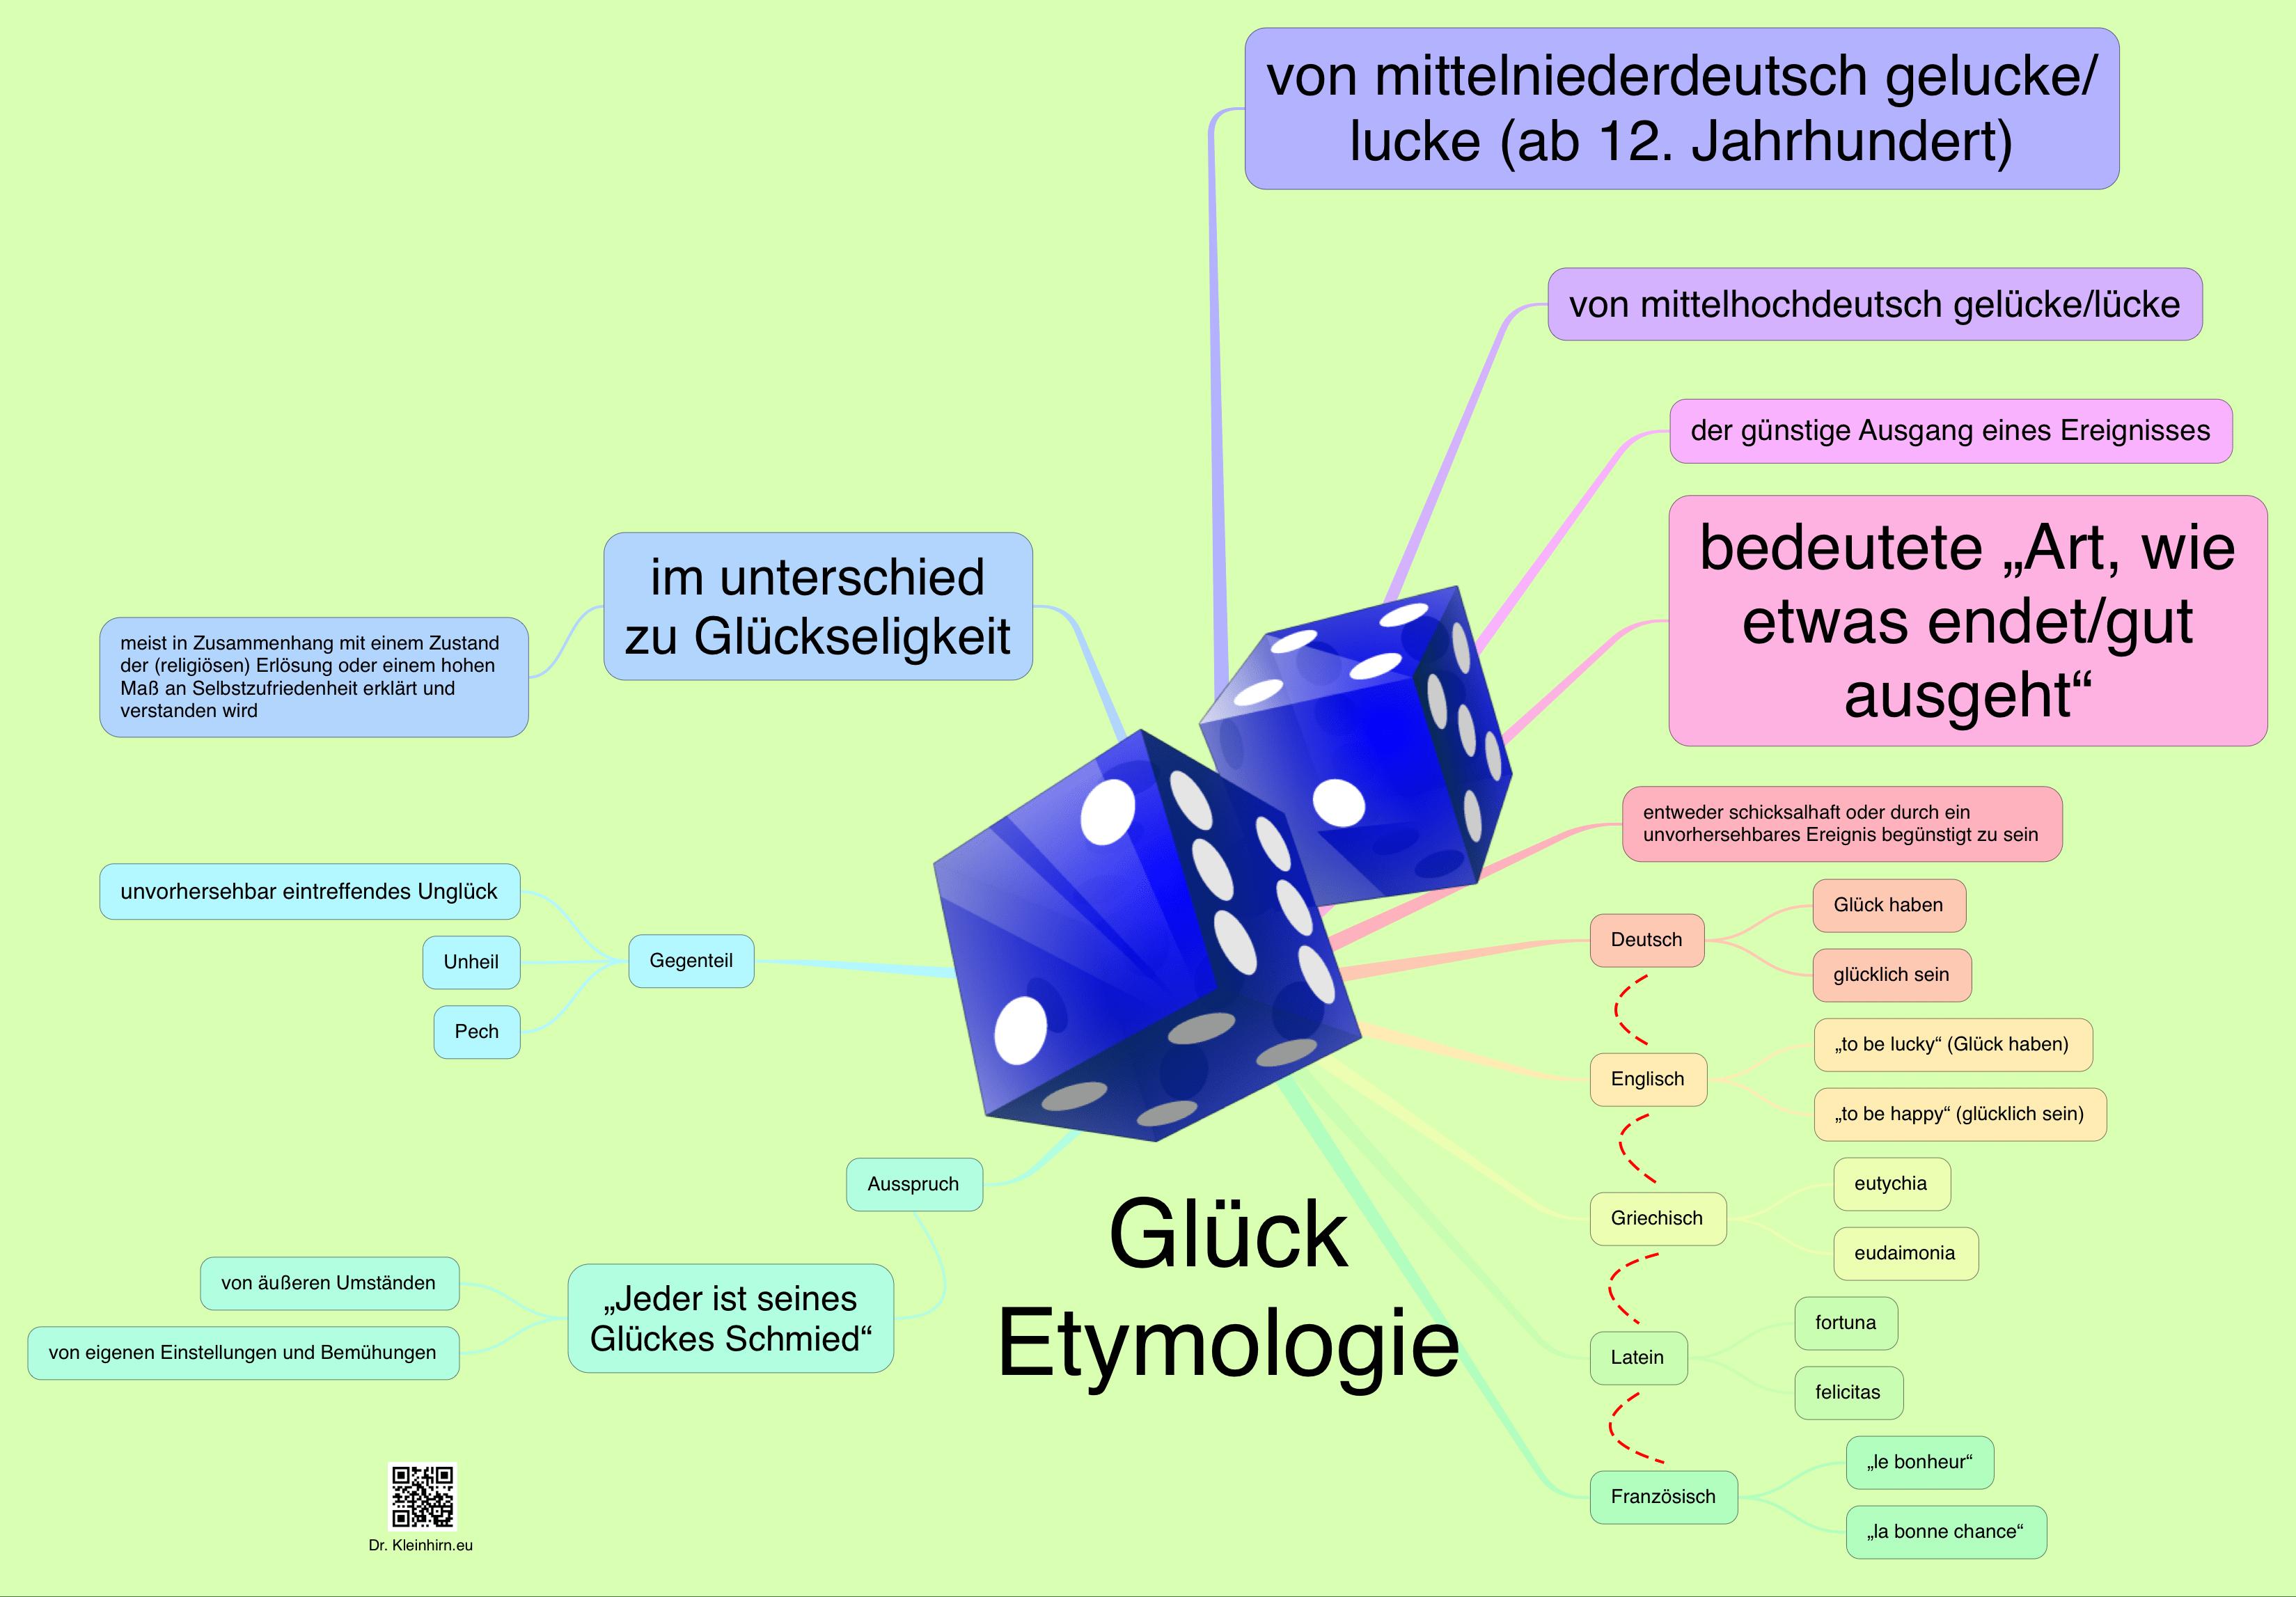 Glück Etymologie